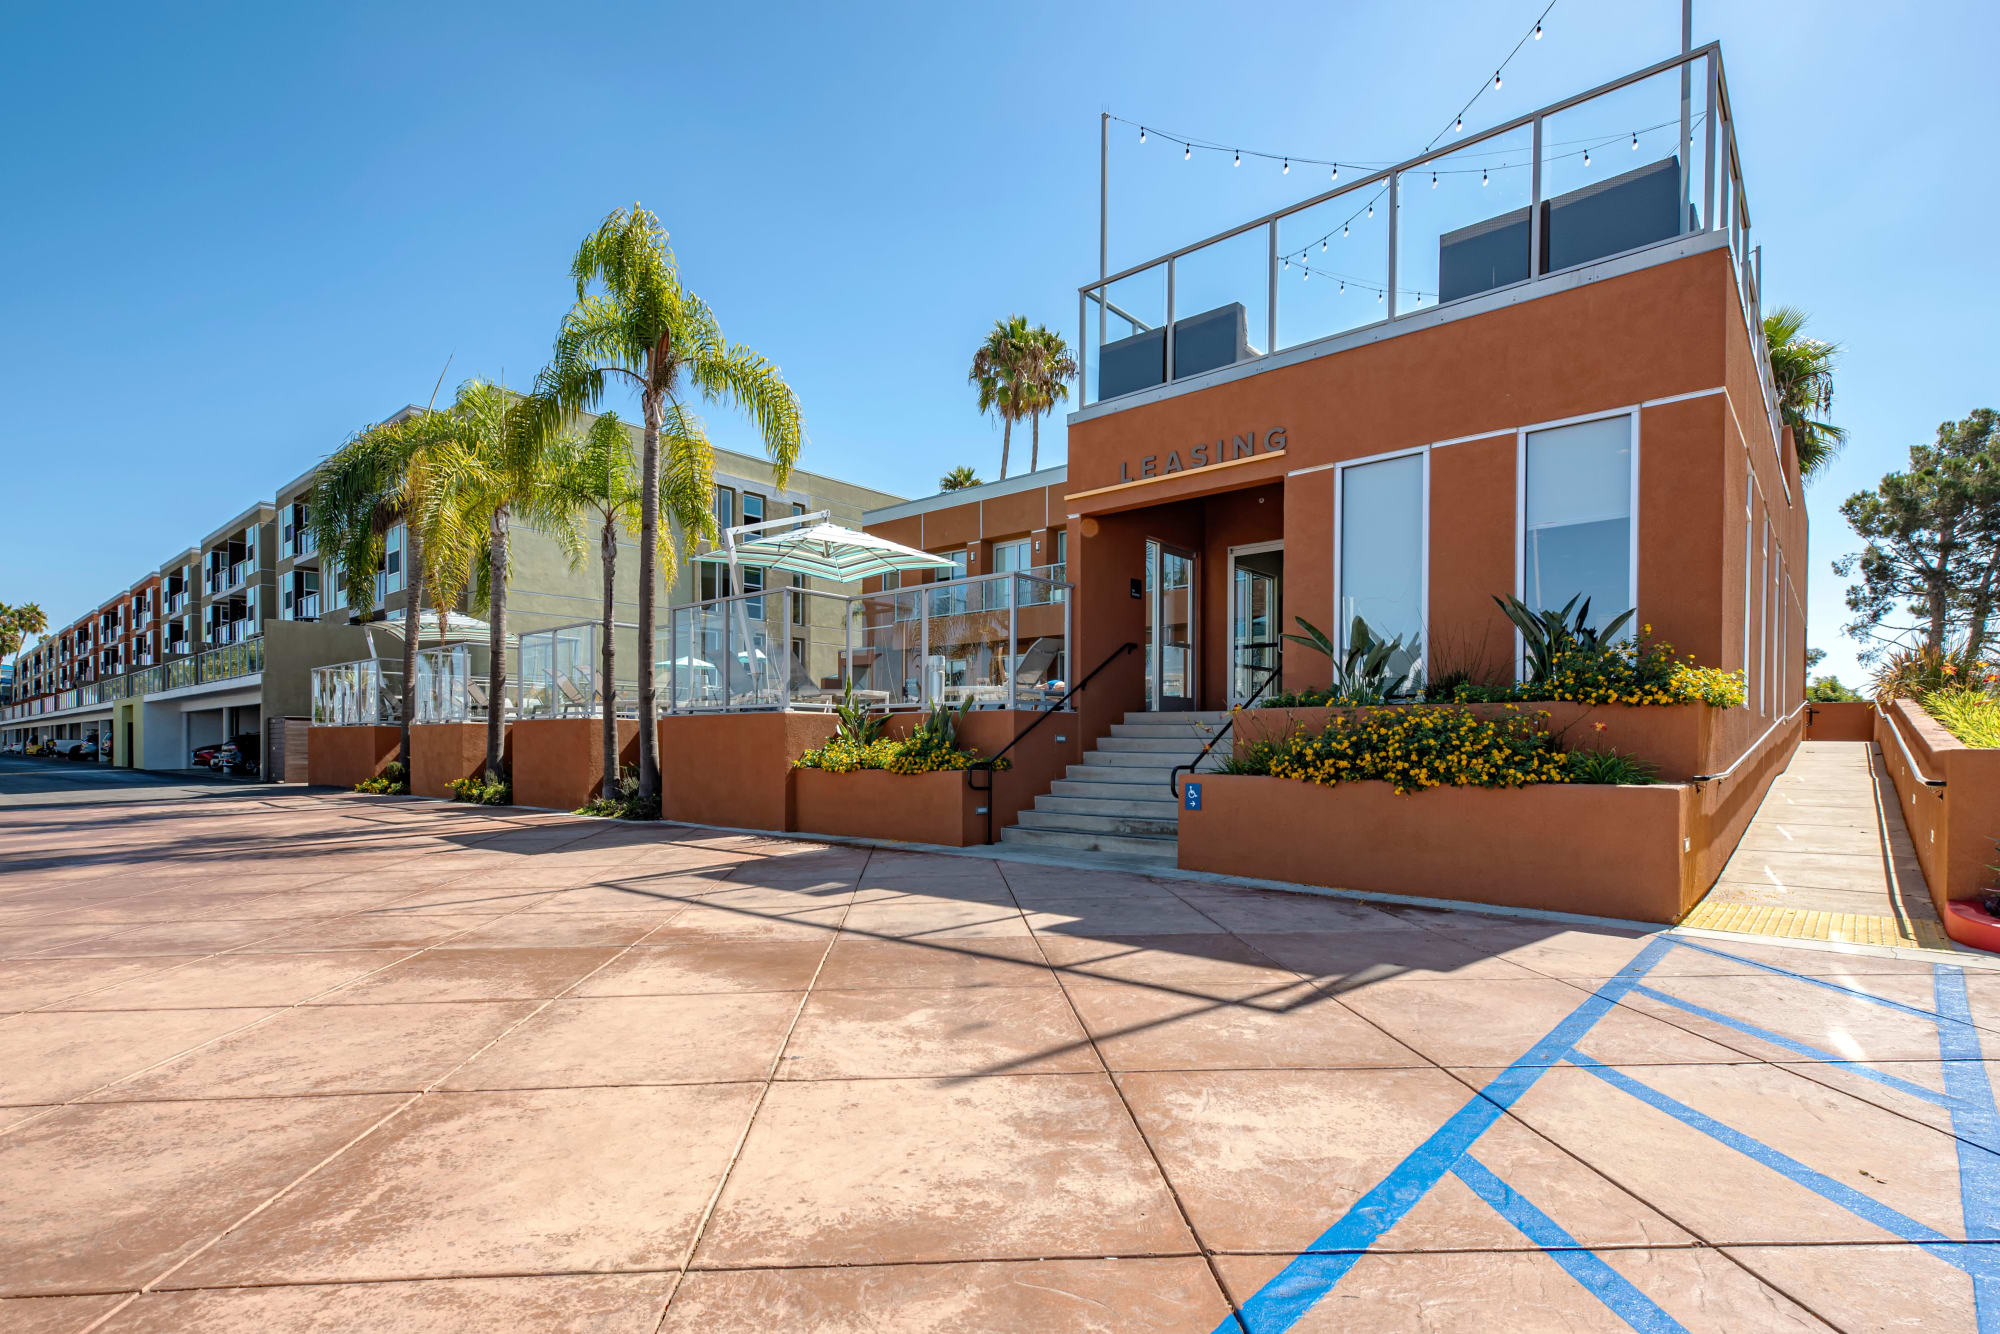 The leasing office at Harborside Marina Bay Apartments in Marina del Rey, California